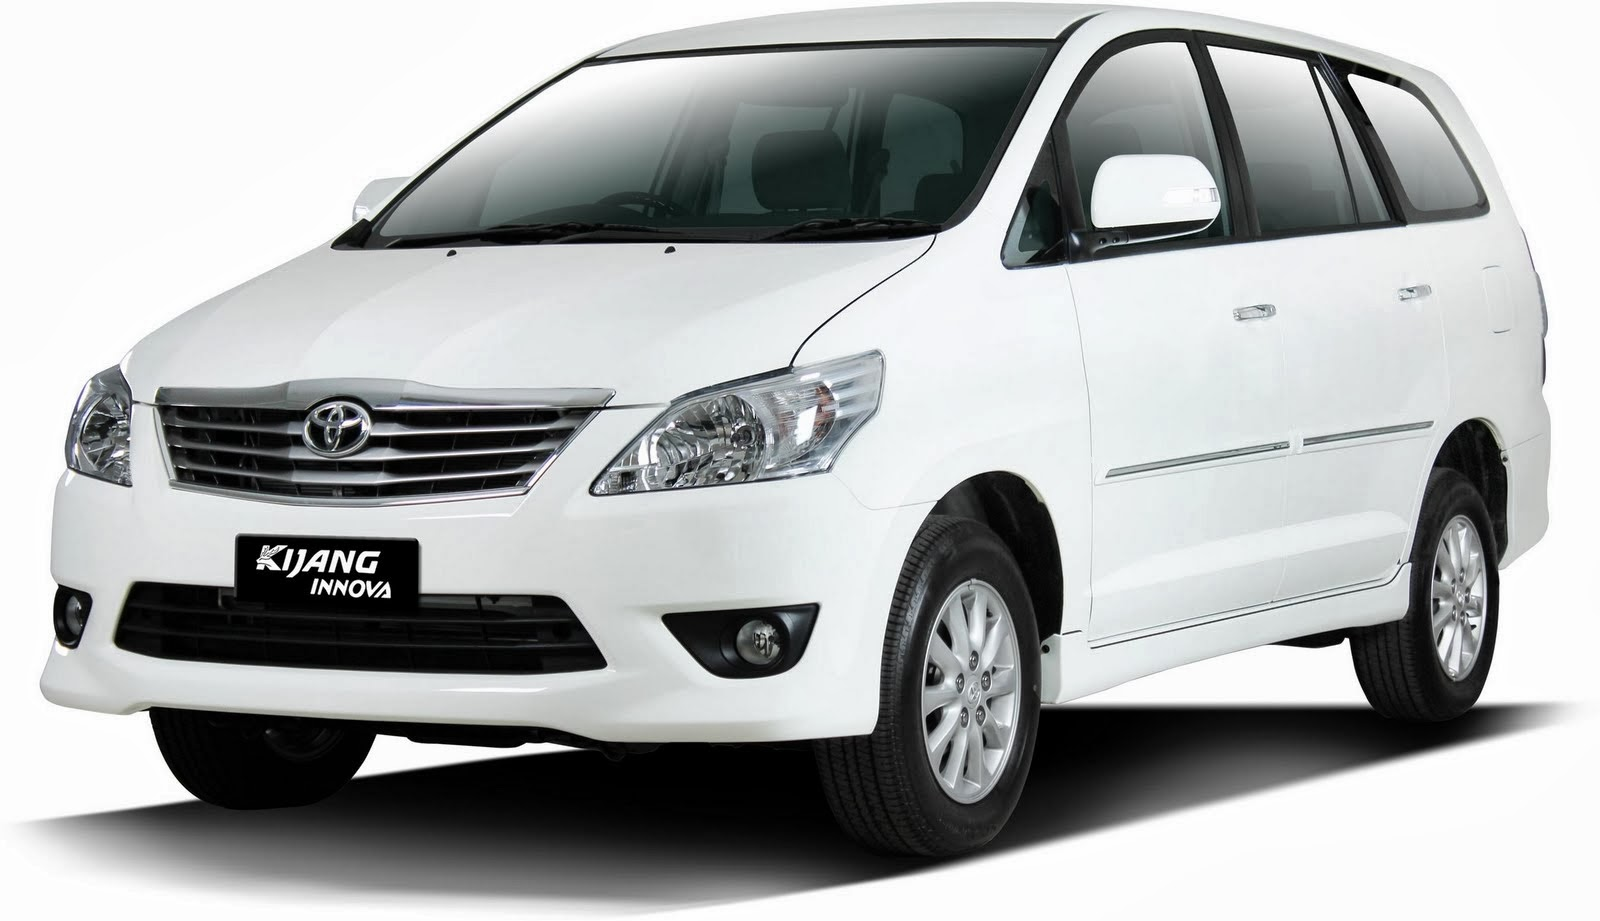 Harga Terbaru Grand New Avanza 2018 E Dan G Daftar Toyota Kijang Innova Berita